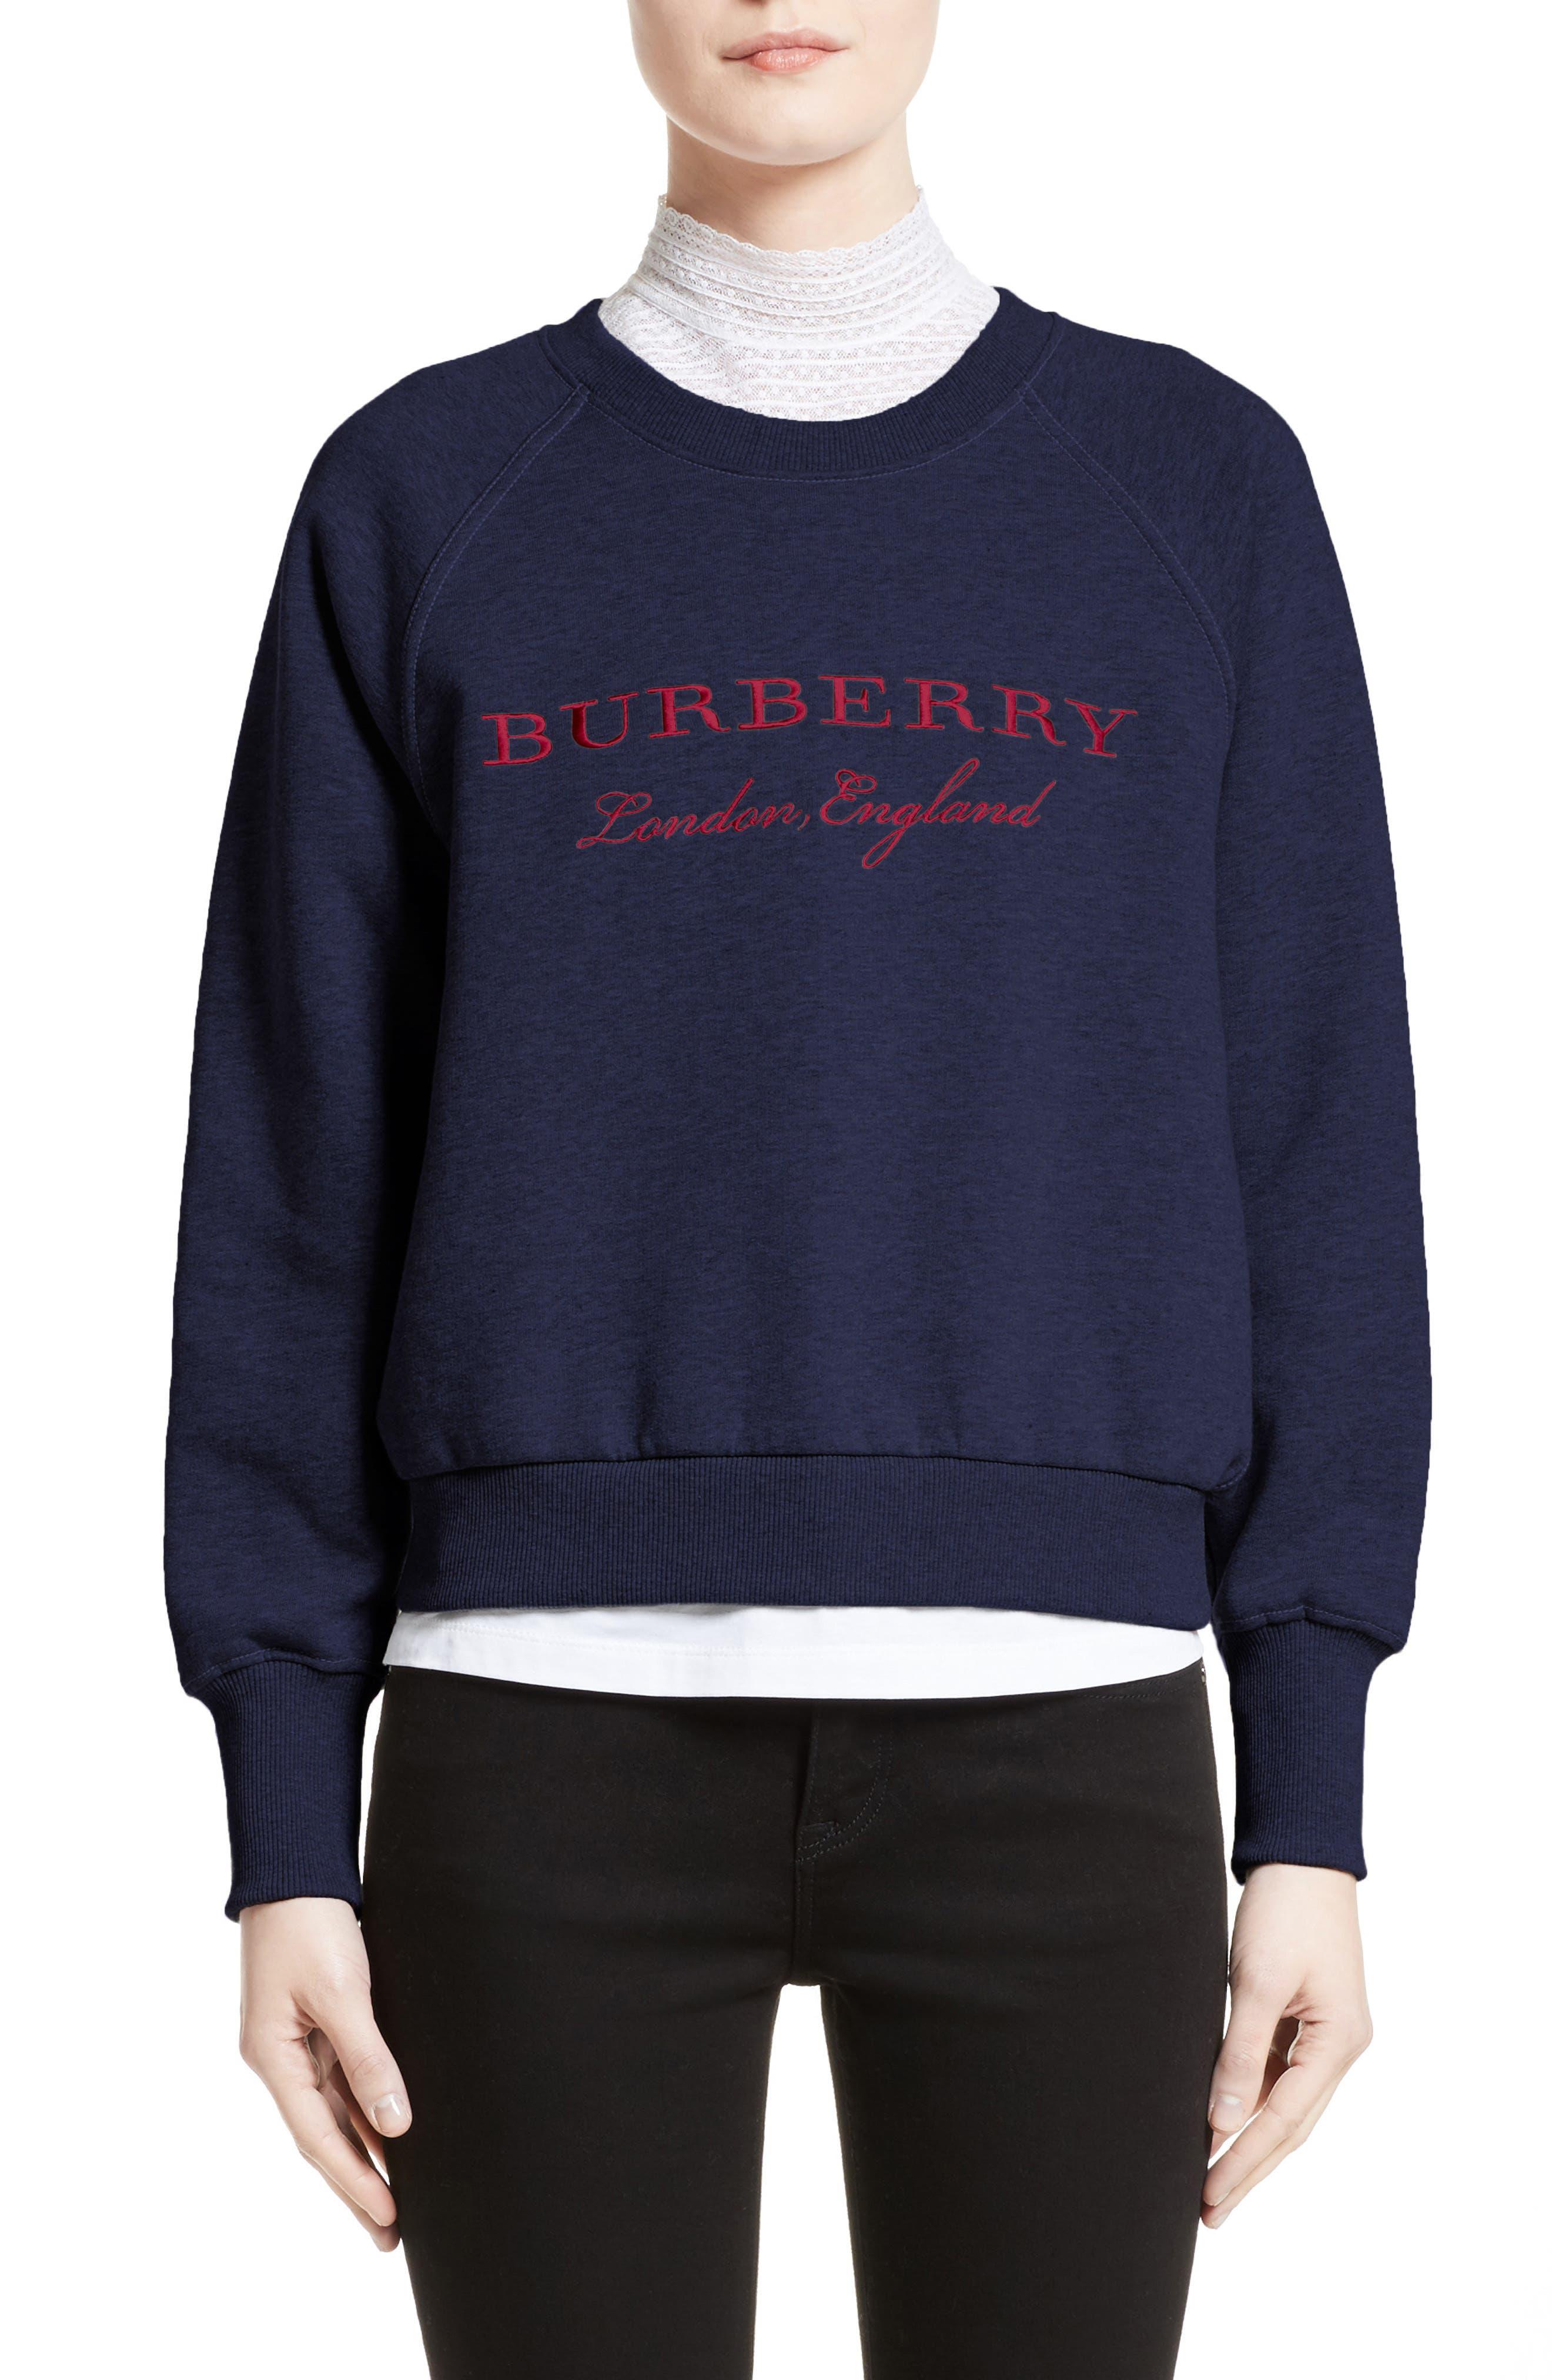 Burberry Torto Embroidered Sweatshirt, Blue